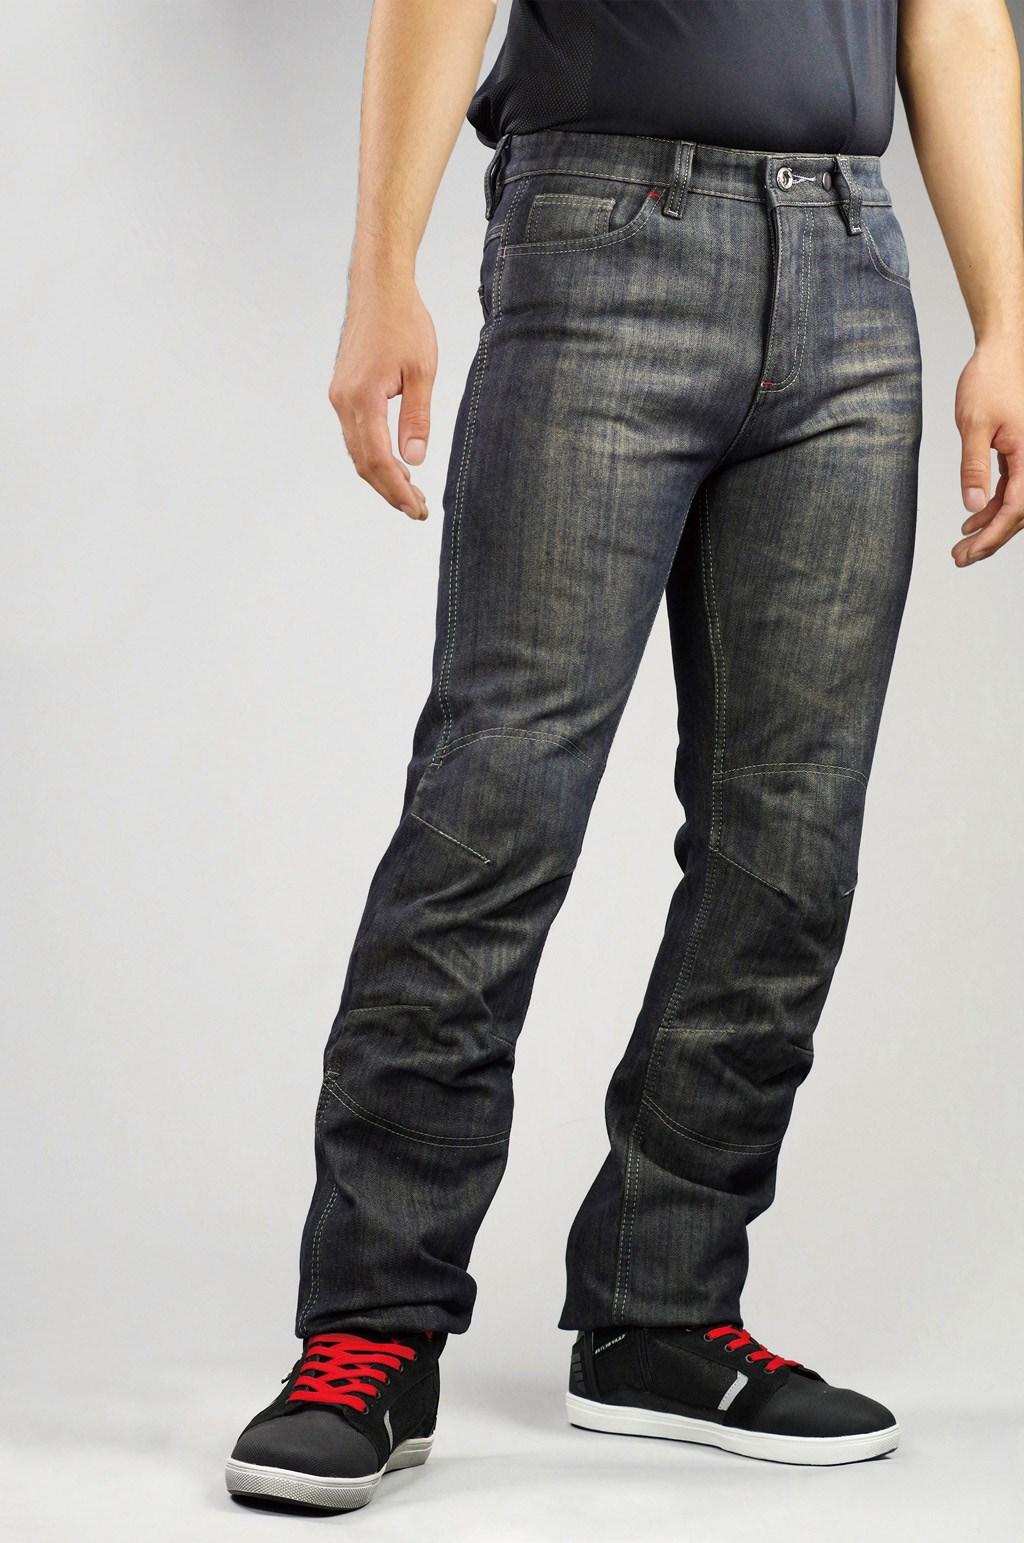 【KOMINE】WJ-932R 女用防風保暖牛仔褲 - 「Webike-摩托百貨」